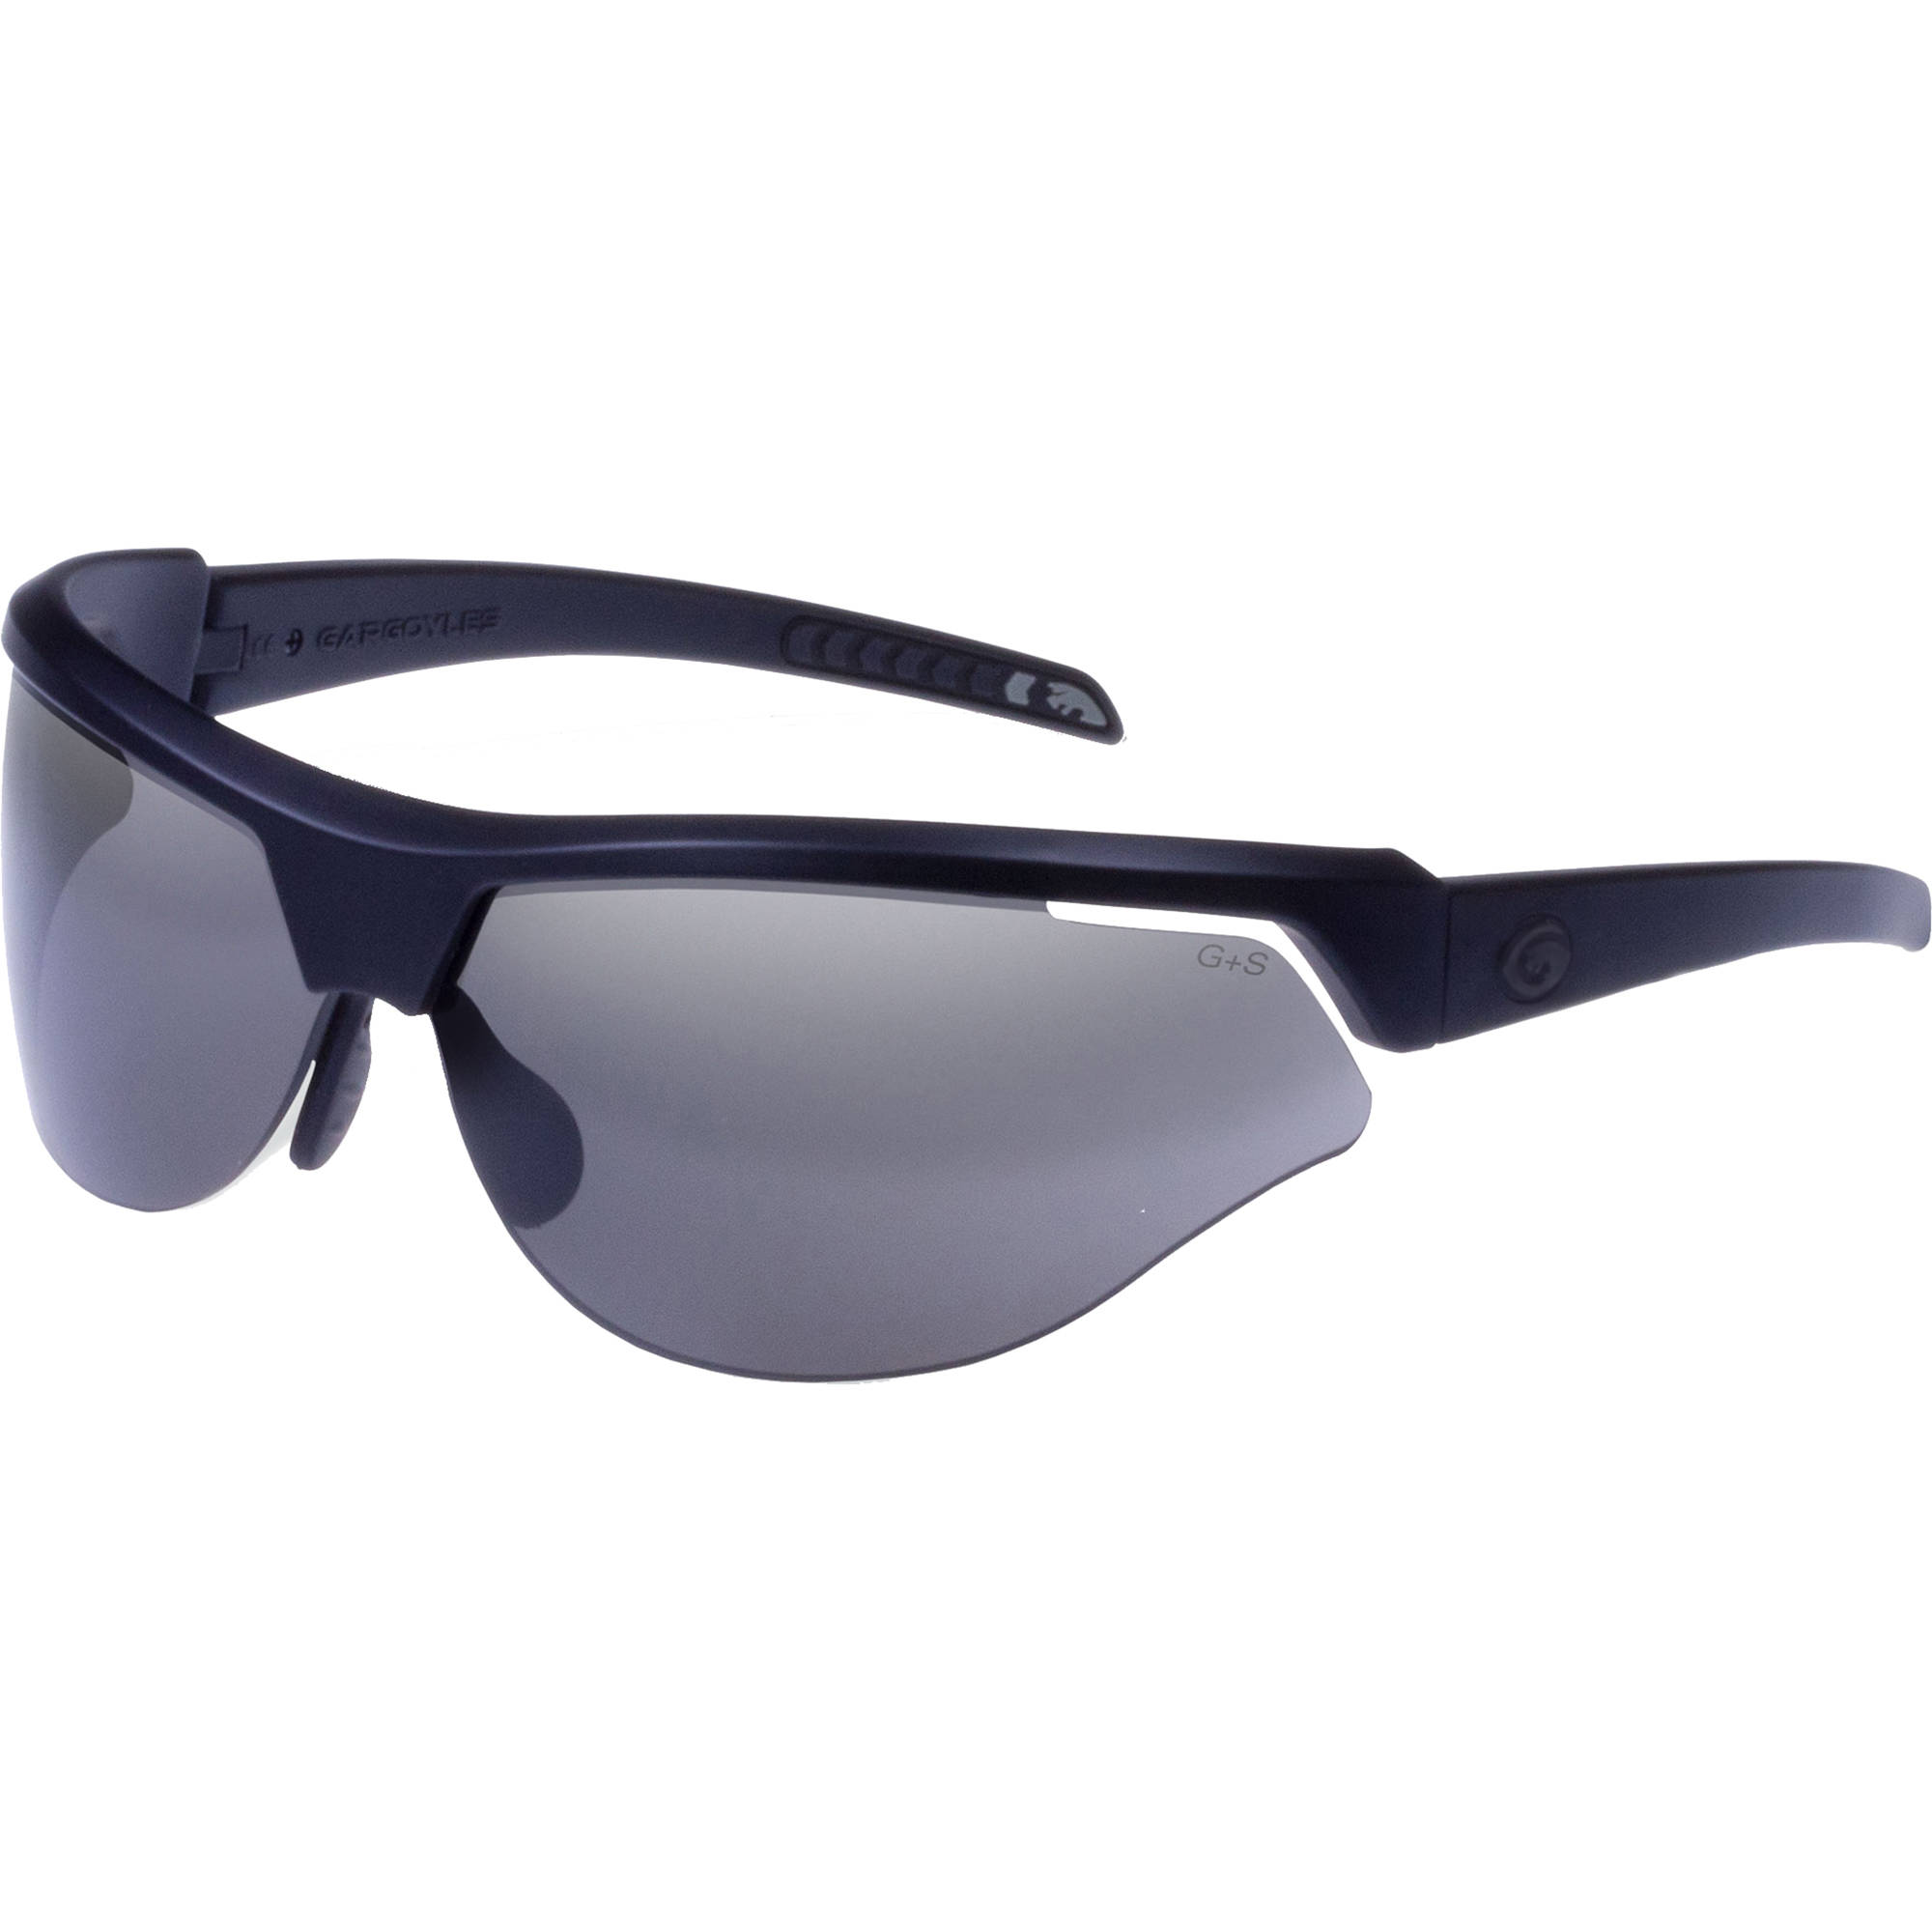 Gargoyles Cardinal-PR Sunglasses 10700166.QTM B&H Photo Video